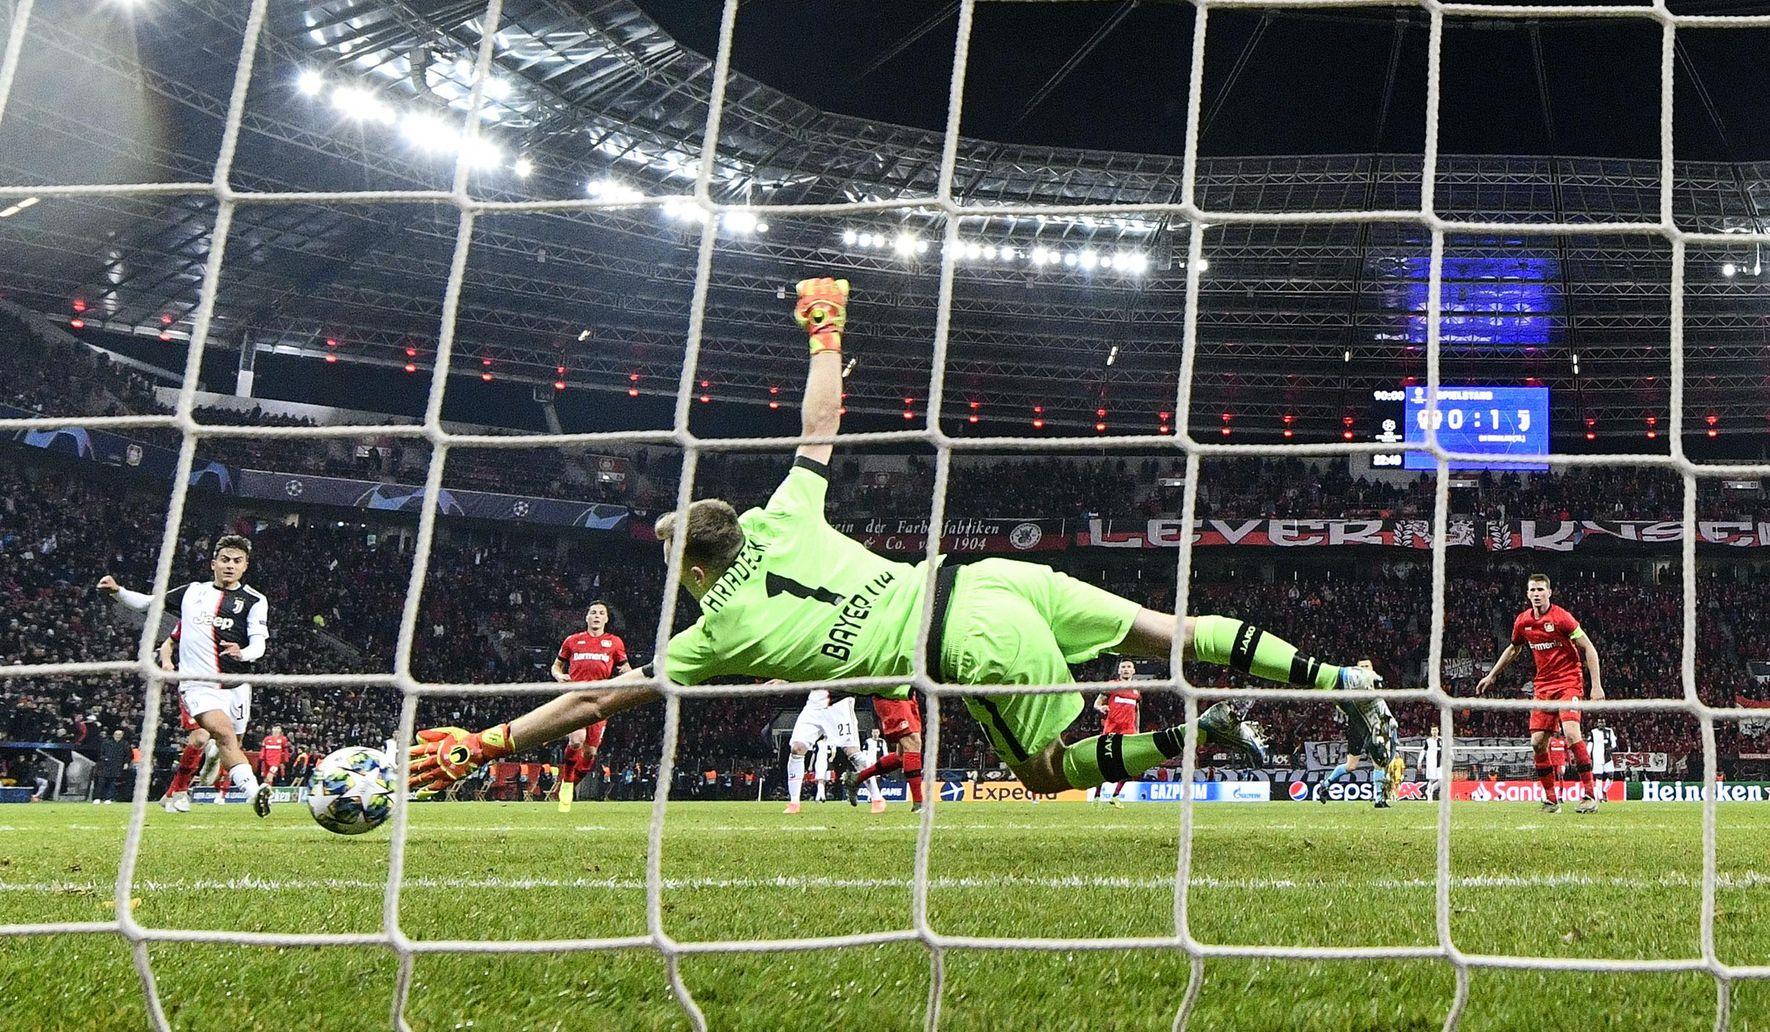 Germany_soccer_champions_league_68037_c26-0-2722-1572_s1770x1032